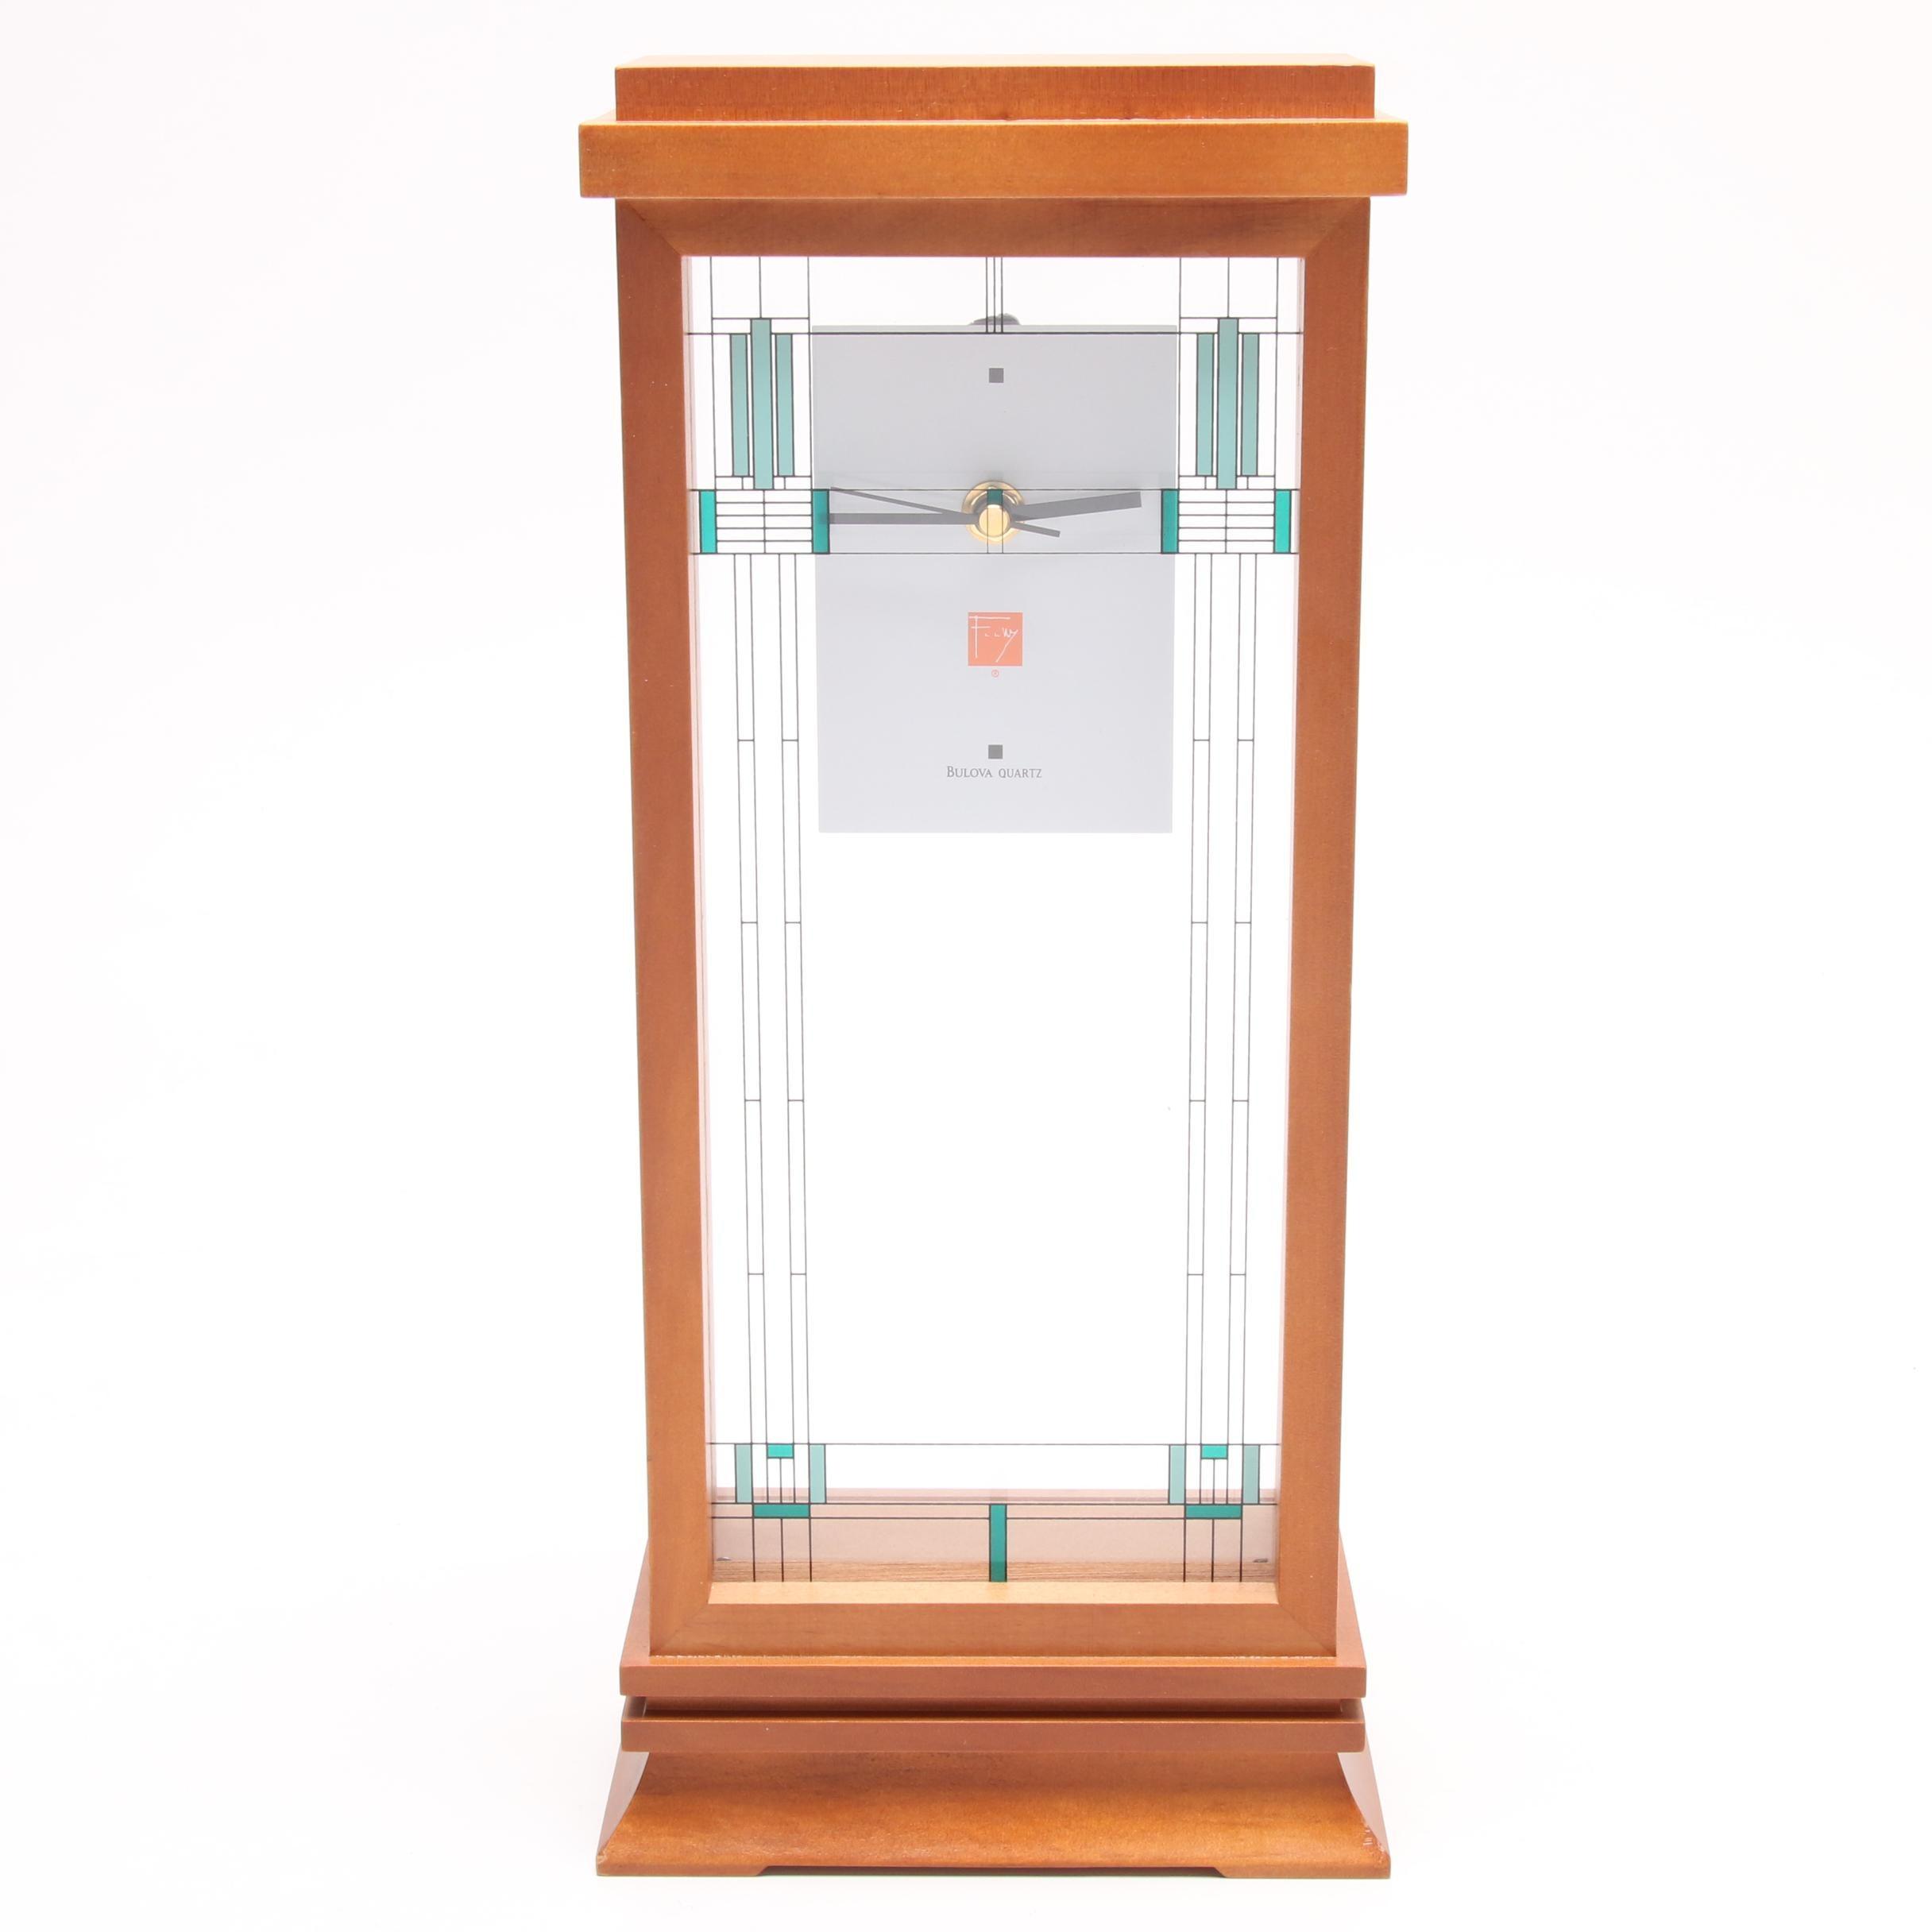 Bulova Quartz Frank Lloyd Wright Collection Mantel Clock (Converted)